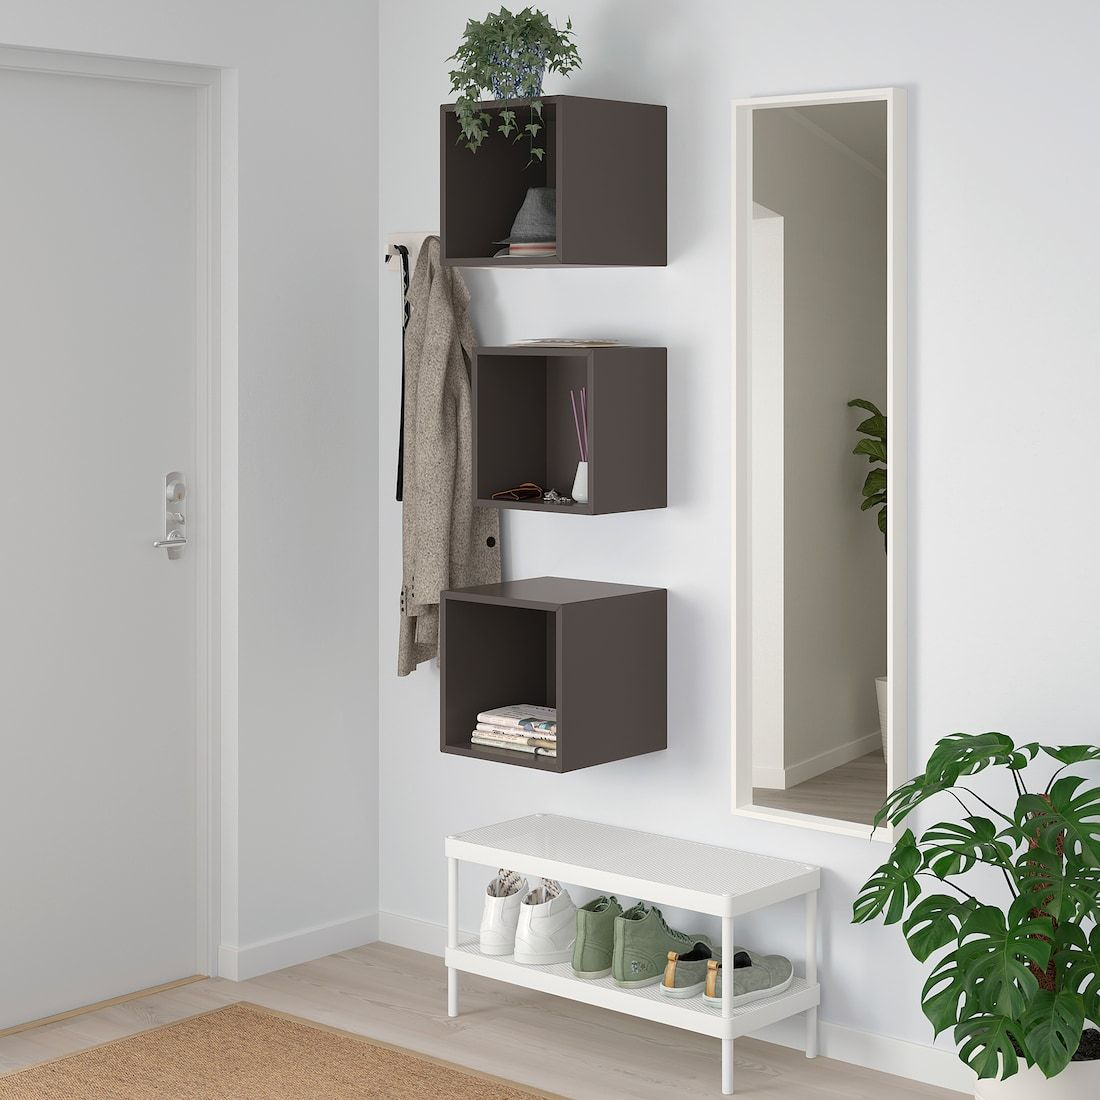 Eket Wall Mounted Cabinet Combination Dark Gray Length 27 Order Here Ikea Wall Mounted Cabinet Eket Ikea Eket